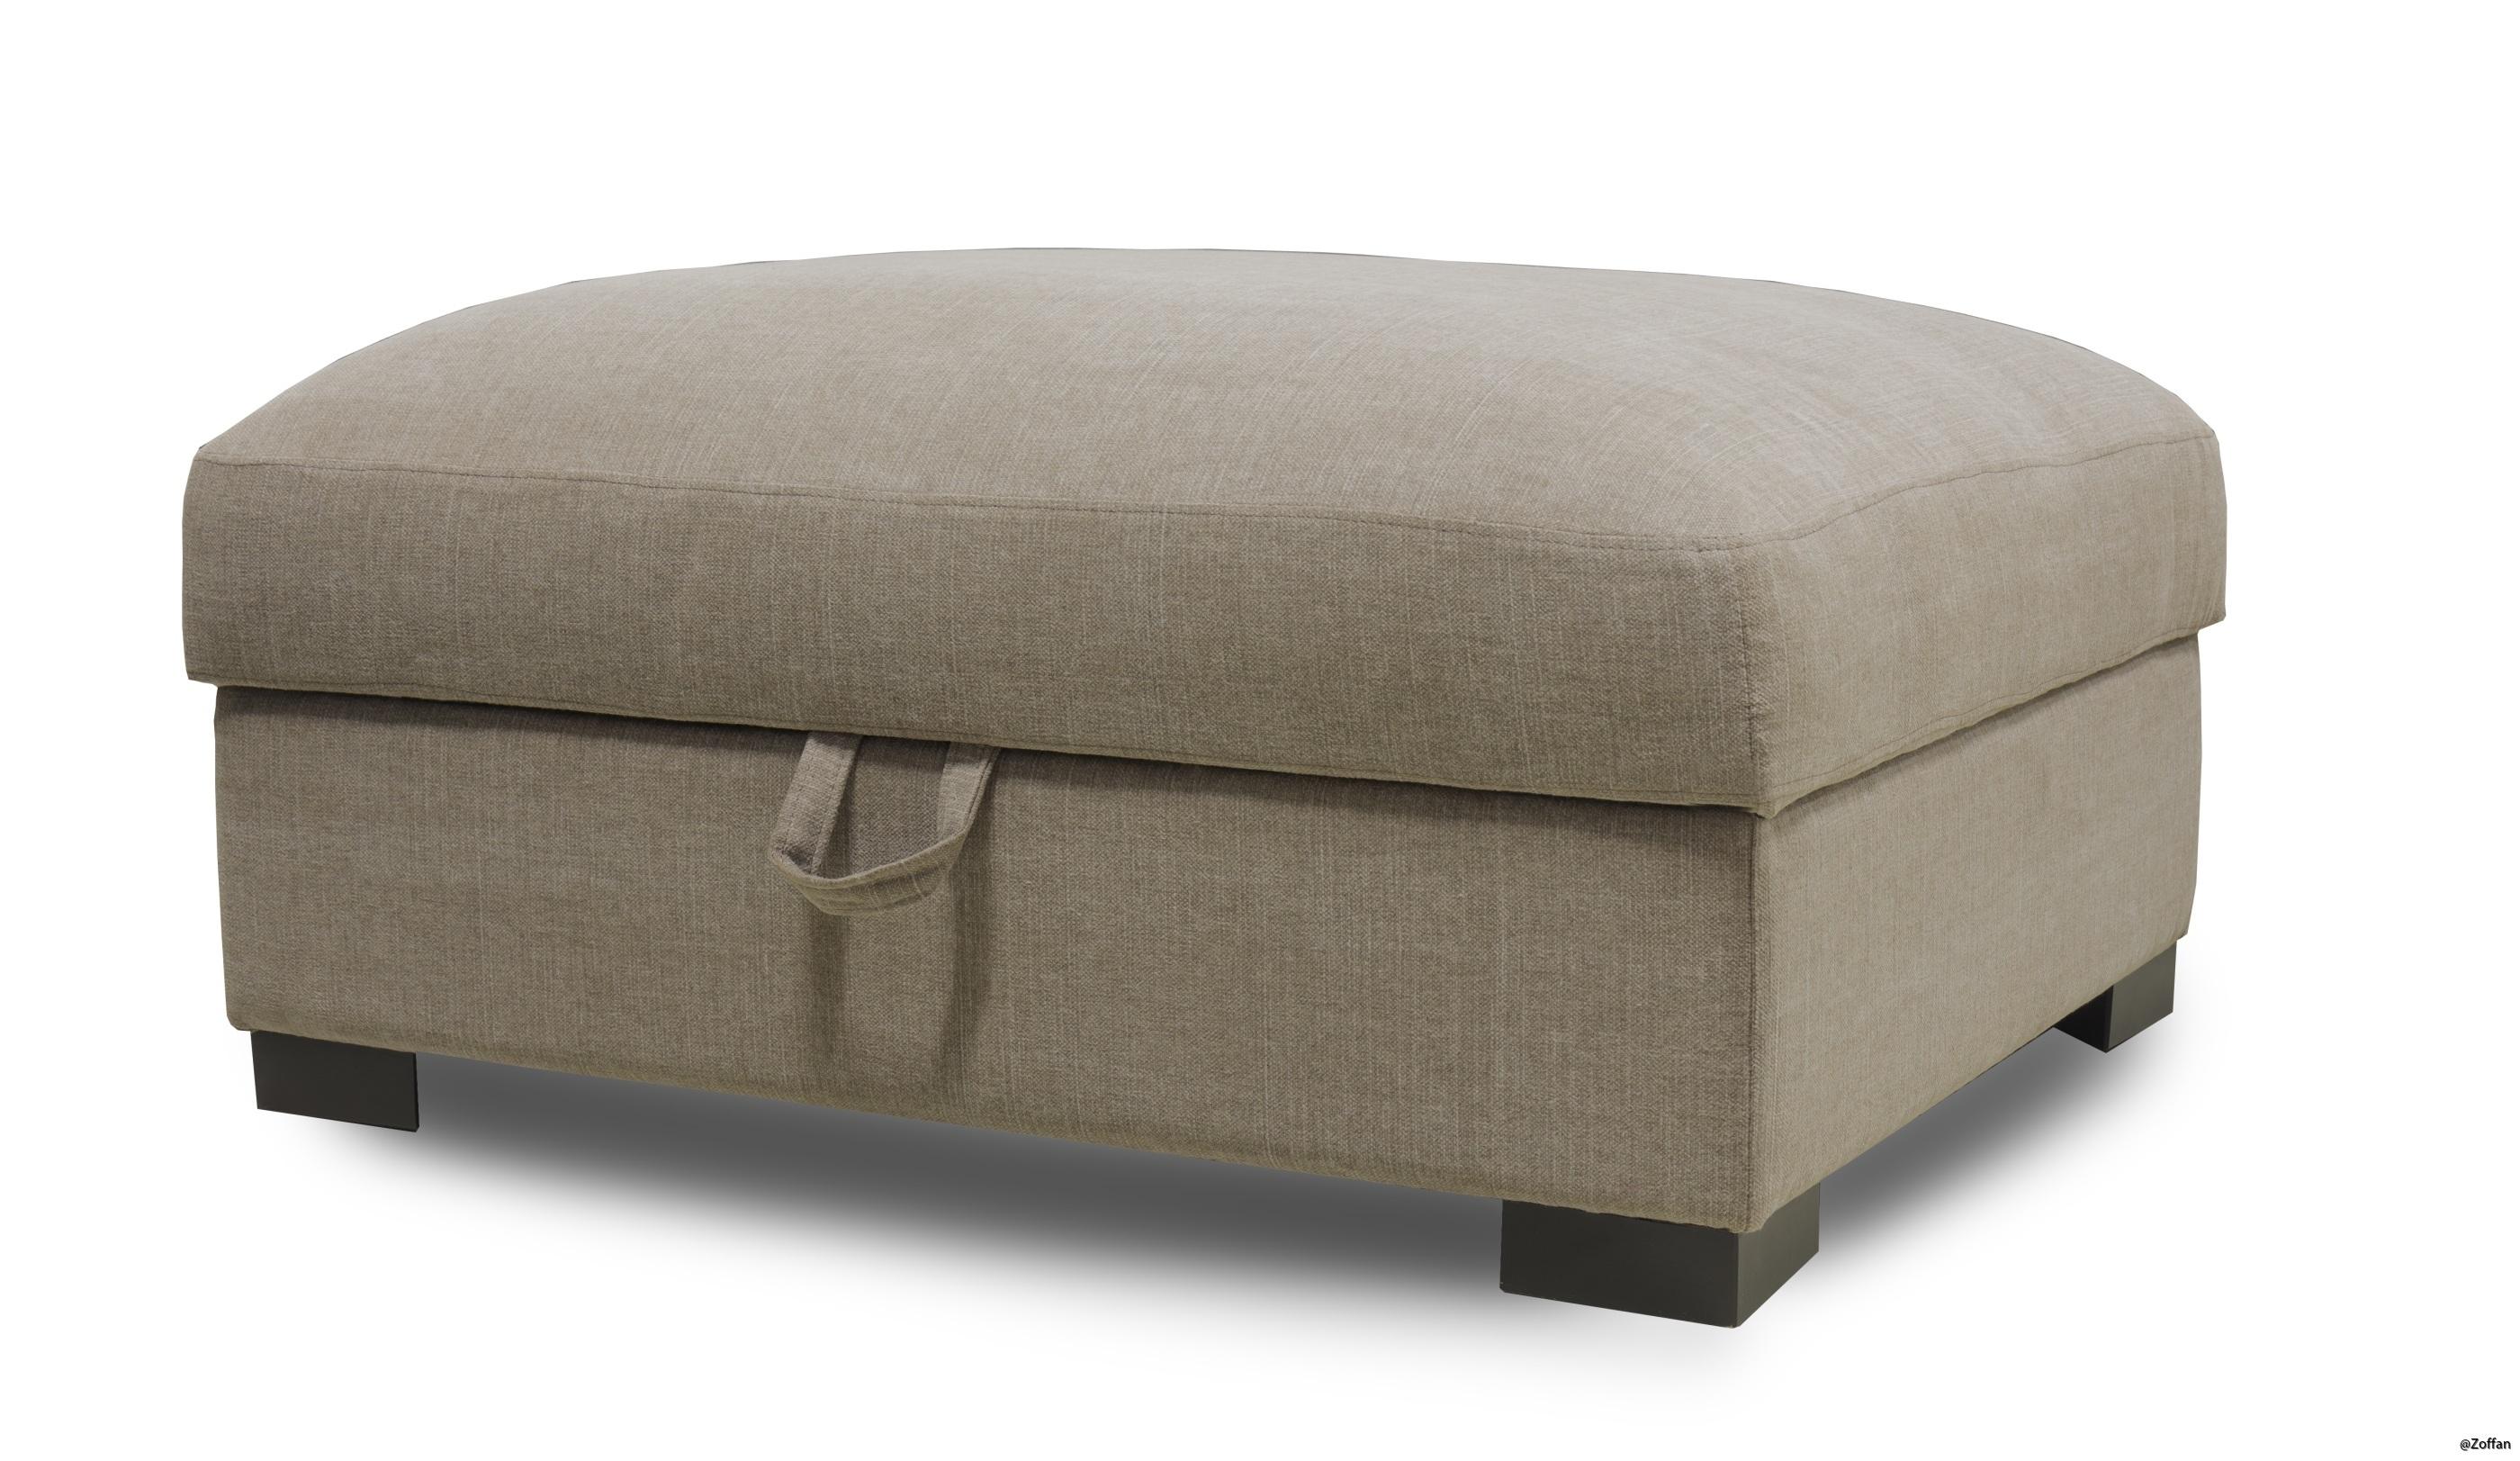 Lounge pall 90x72 cm KISS 1000 px